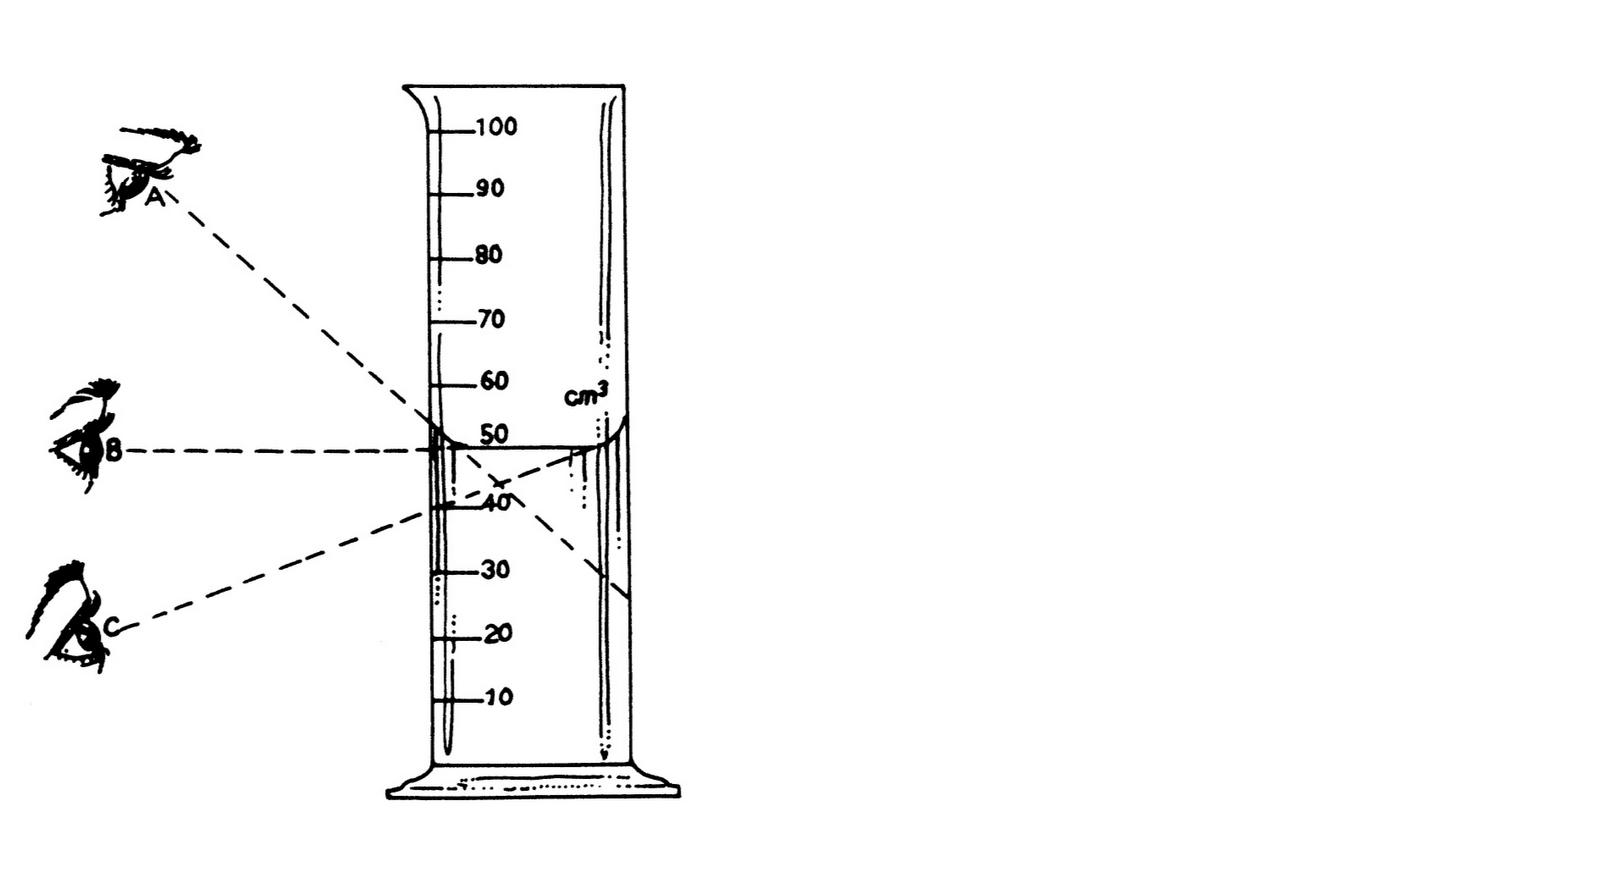 Ysc Measuring Volume Of Water